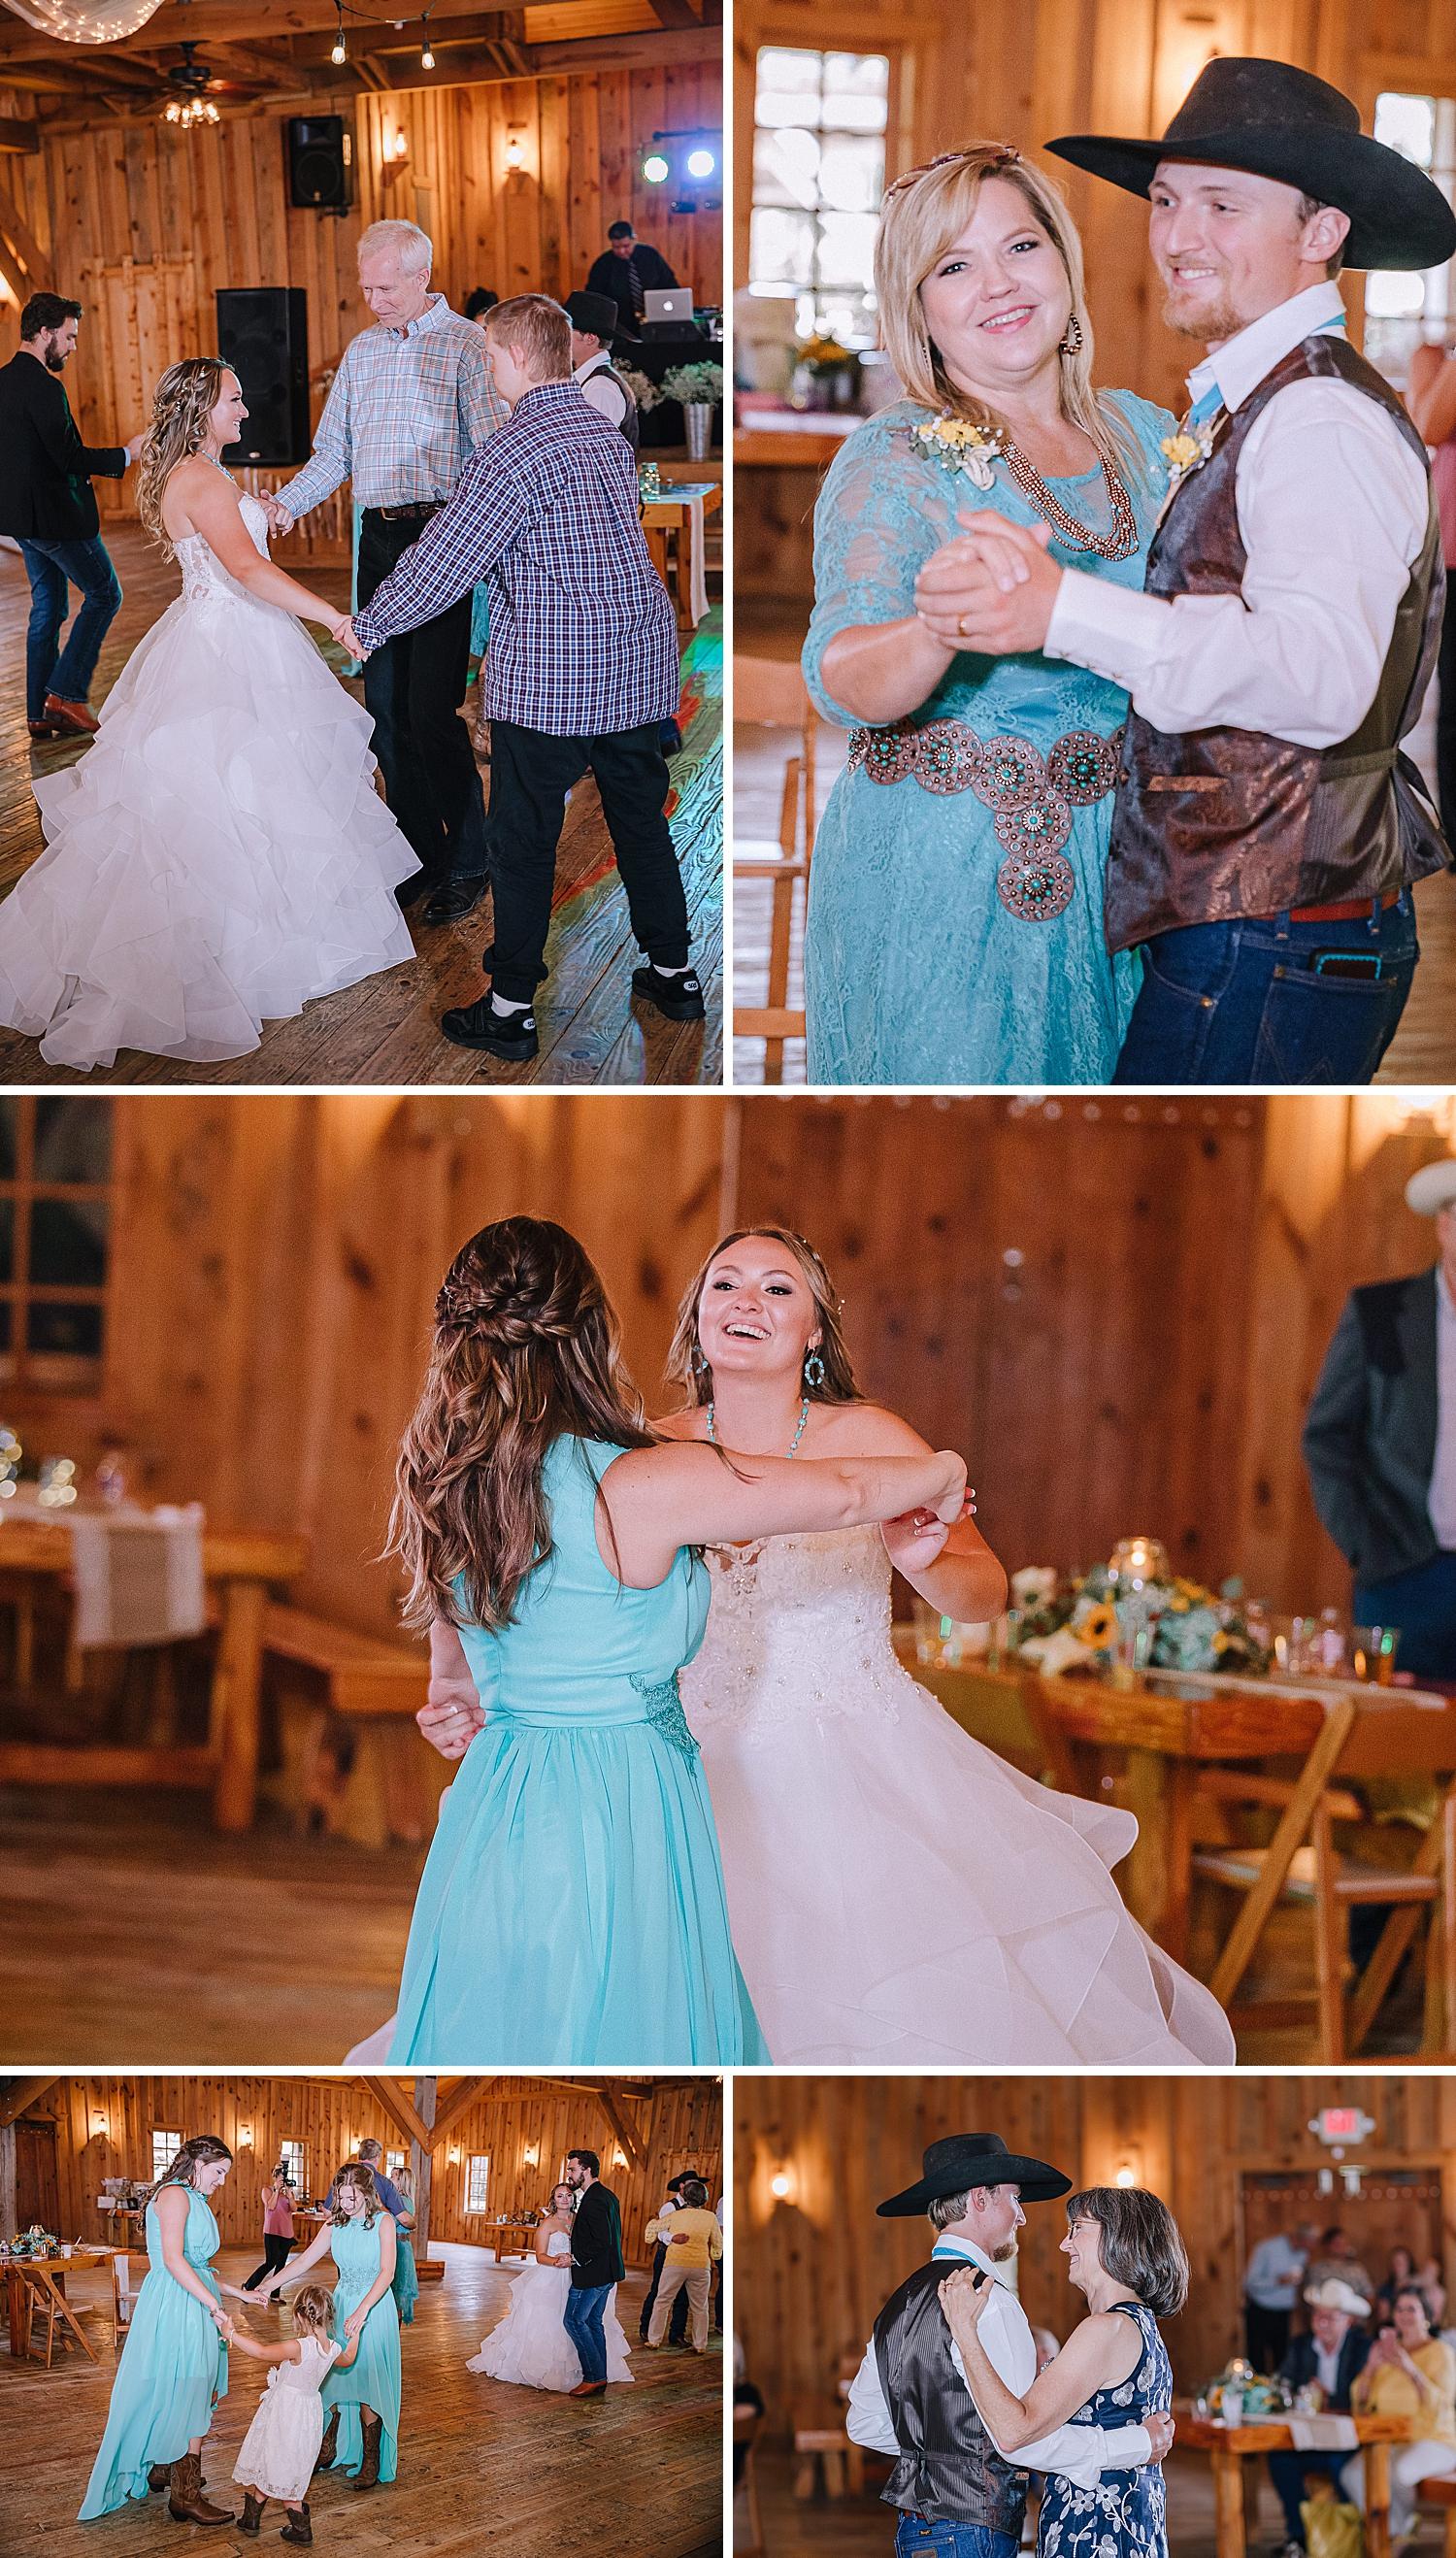 Carly-Barton-Photography-Old-Town-Texas-Rustic-Wedding-Photos-Sunflowers-Boots-Kyle-Texas_0112.jpg